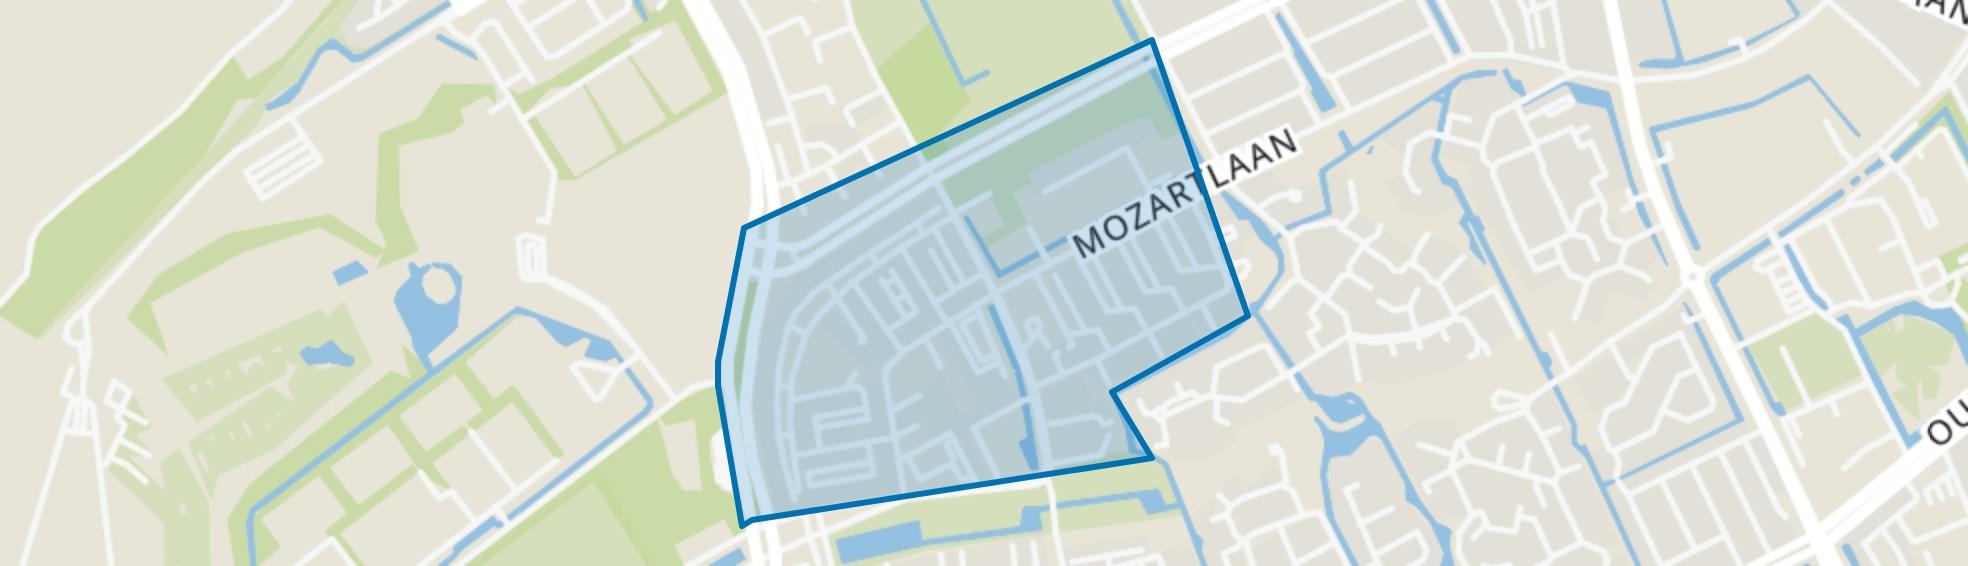 Waldeck-Noord, Den Haag map